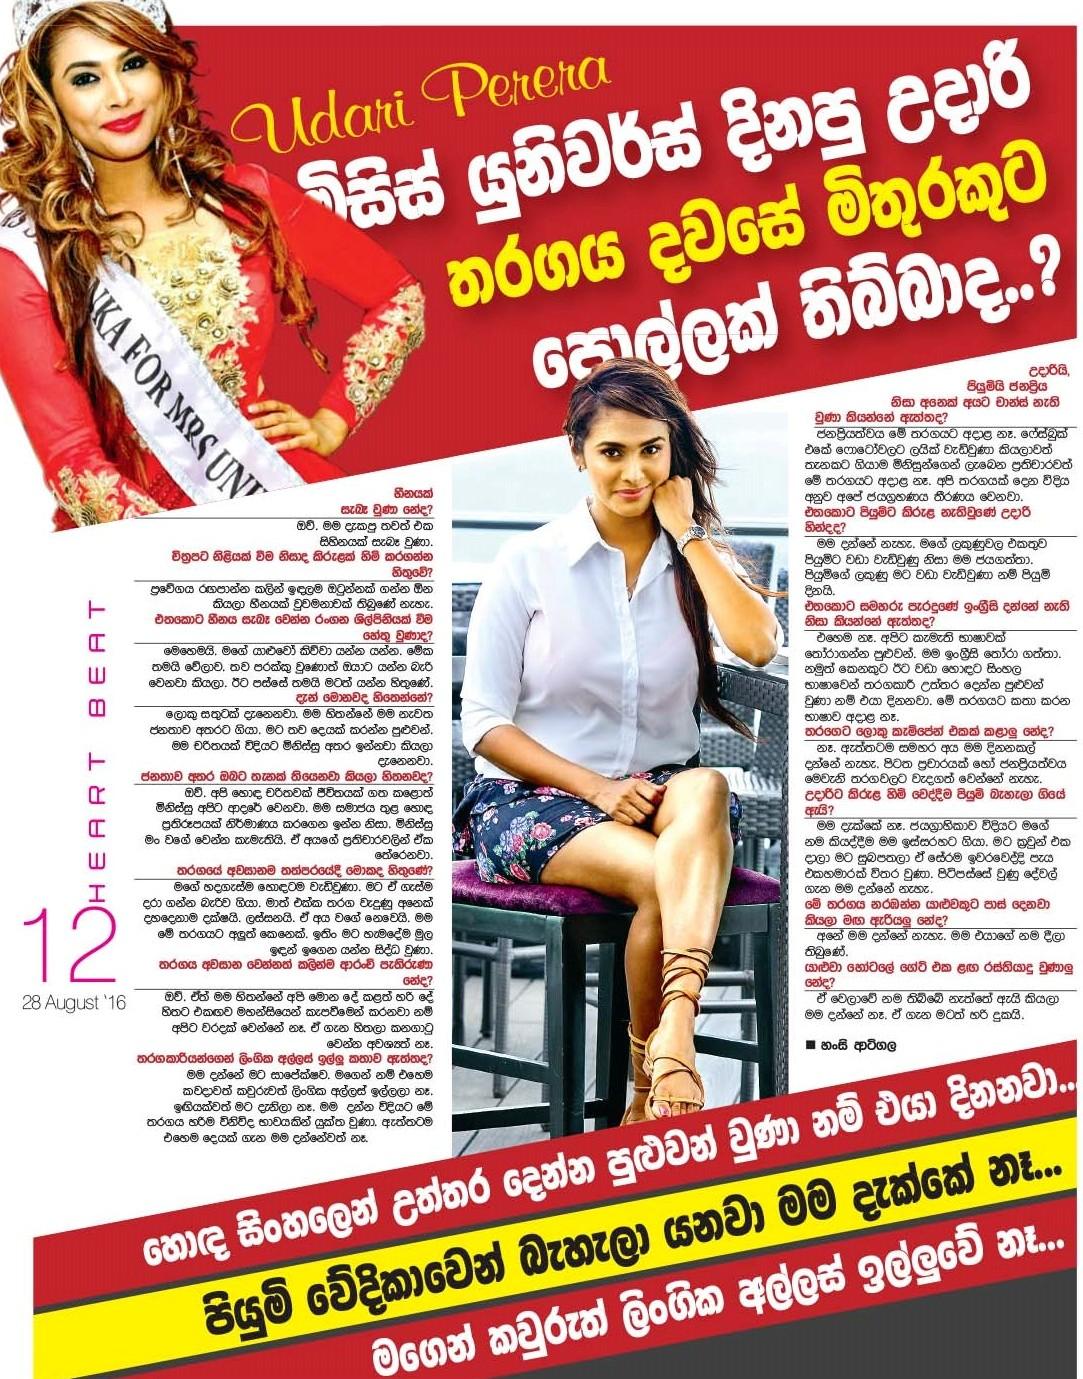 Gossip Lanka chat with Udari Perera Ranasinghe